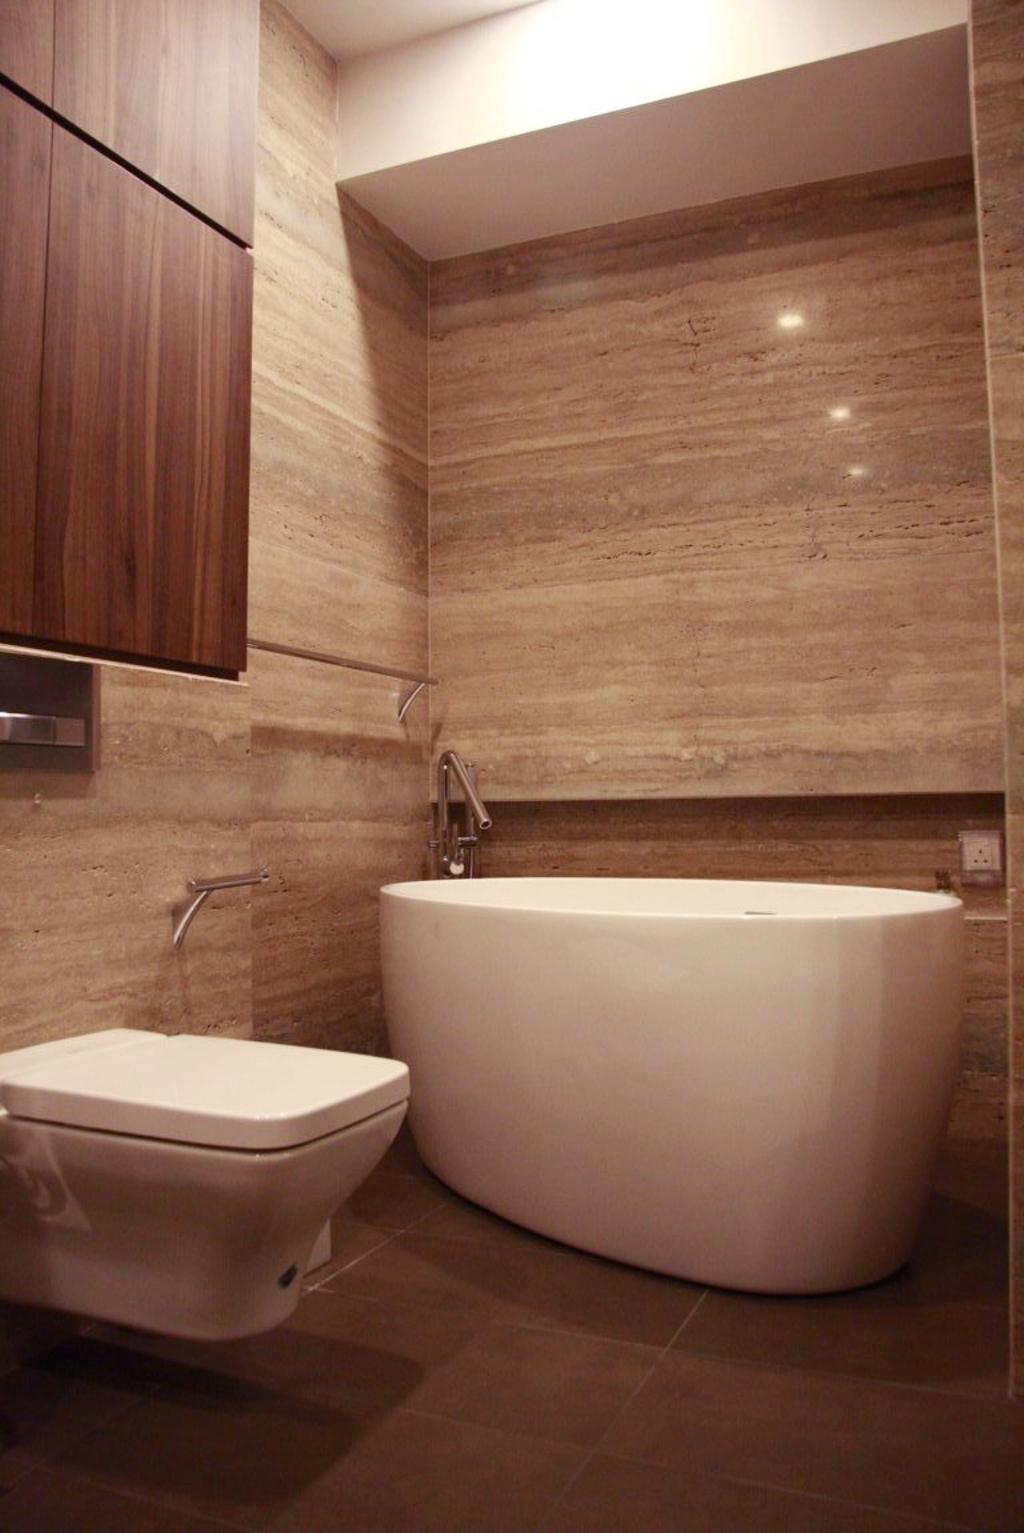 Modern, Condo, Bathroom, Parkvale, Architect, Czarl Architects, Bathtub, Water Closet, Toilet Bowl, Wooden Storage, Toilet Storage, Bidet, Tiled Wall, Bath Storage